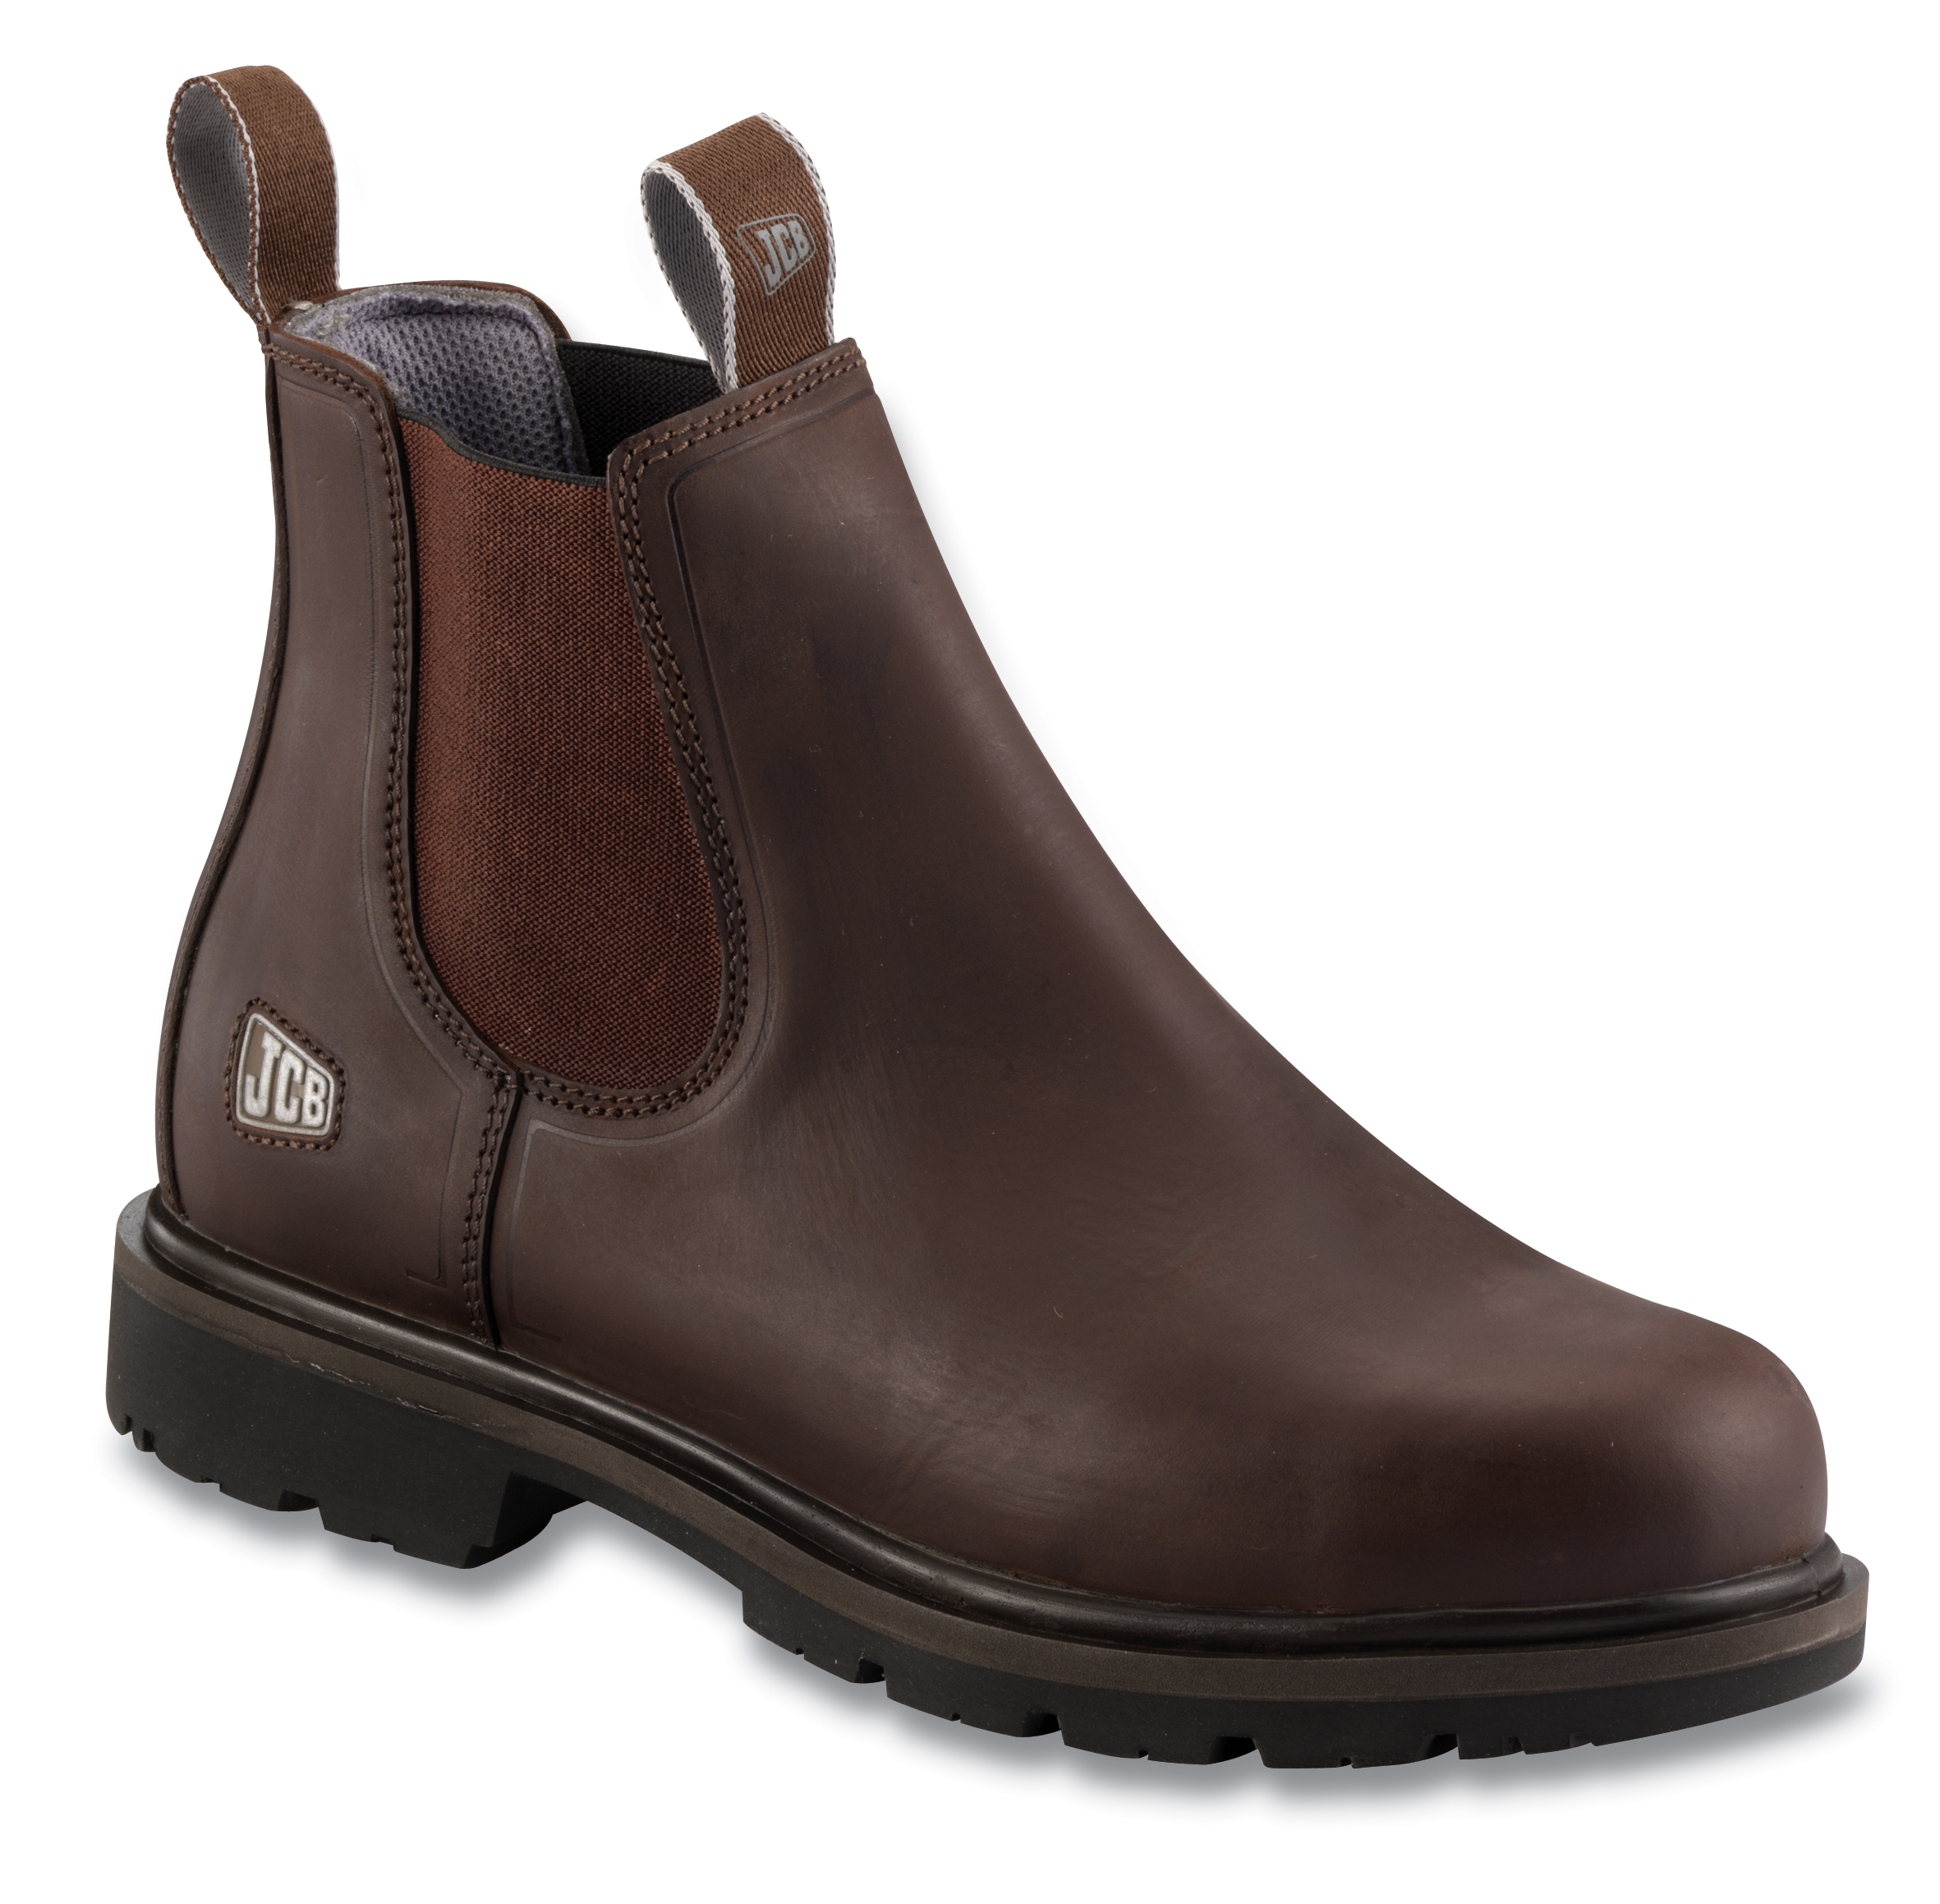 b50beb9b9b4 Progressive Safety JCB Agmaster Boots